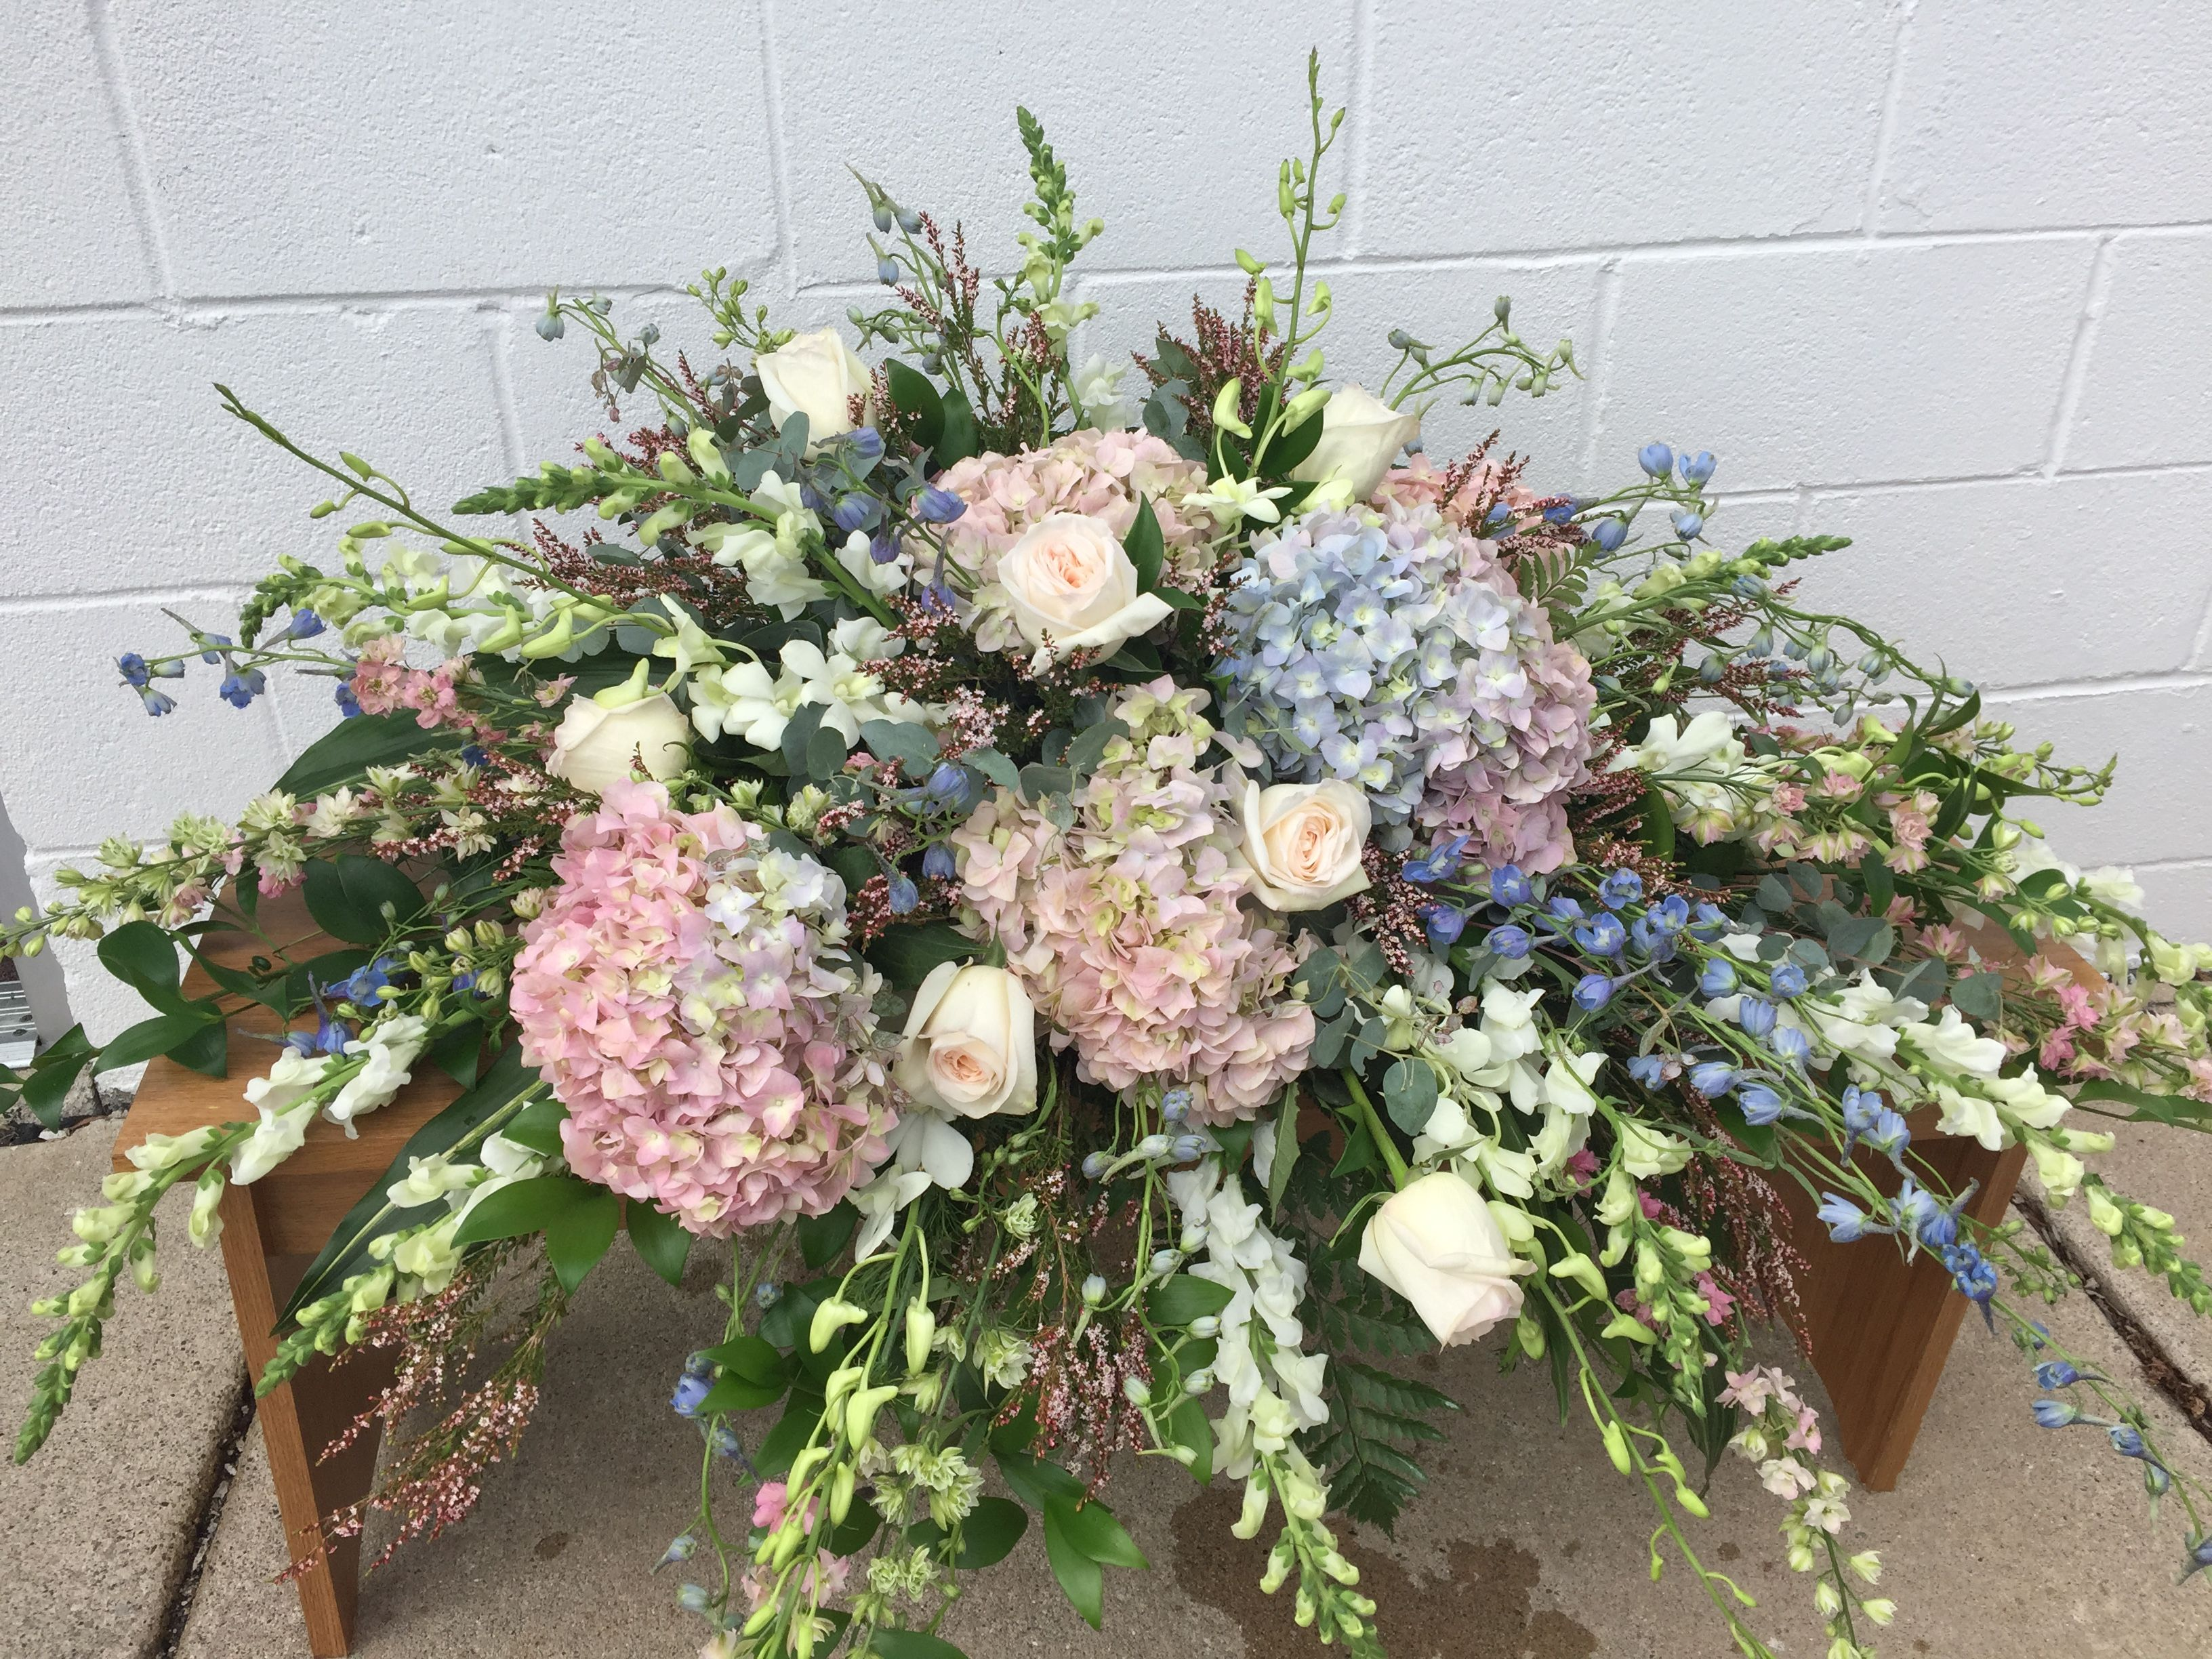 I Think This Is The Most Beautiful Spring Hydrangea Casket Spray Hydrangea Flower Arrangements Funeral Flower Arrangements Funeral Spray Flowers